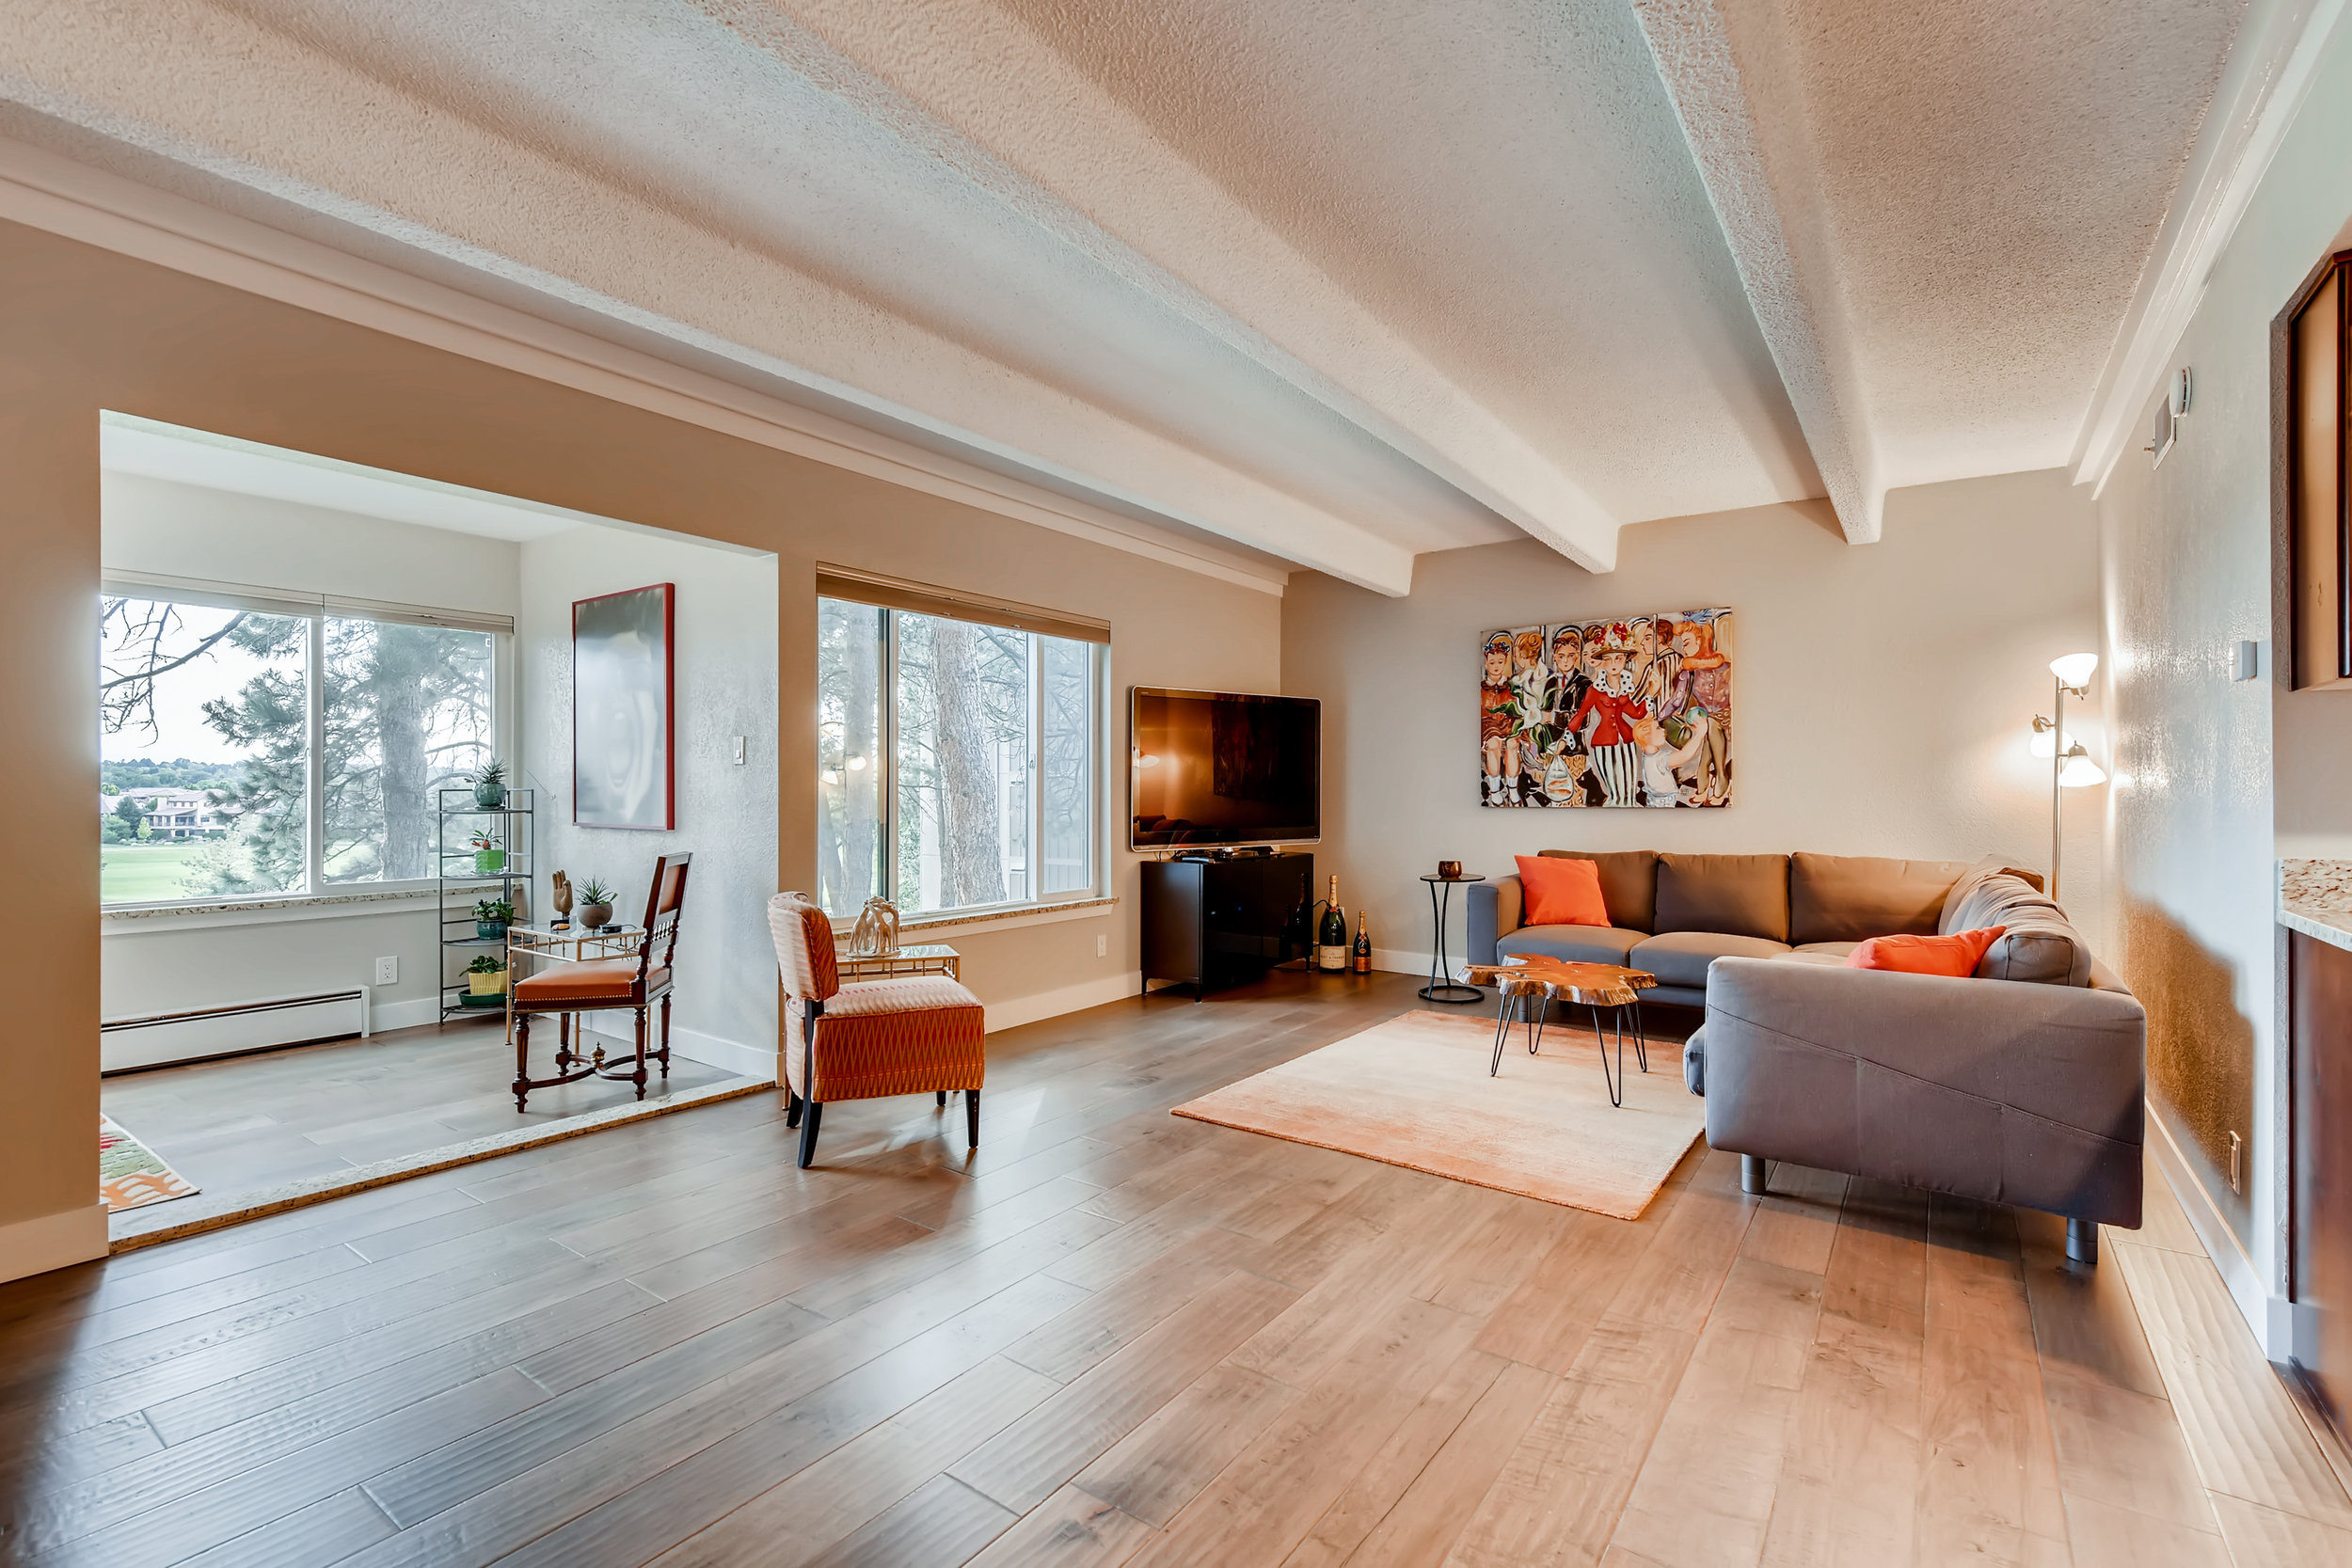 2525 S Deyton Way Unit 1107-print-007-023-Living Room-3600x2400-300dpi.jpg